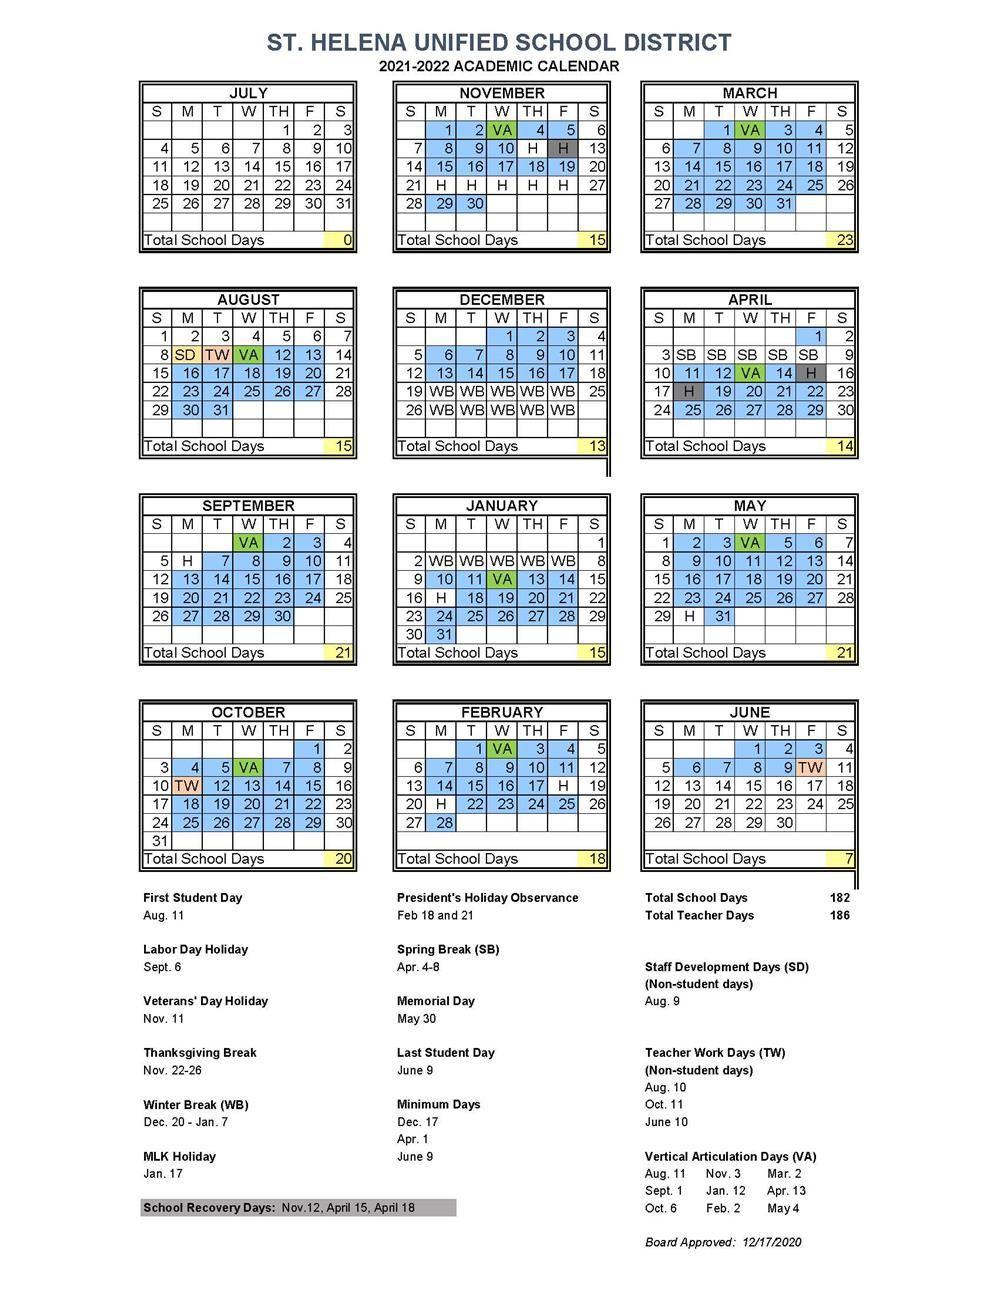 Uc Berkeley Academic Calendar Fall 2022.Academic Calendar 2021 2022